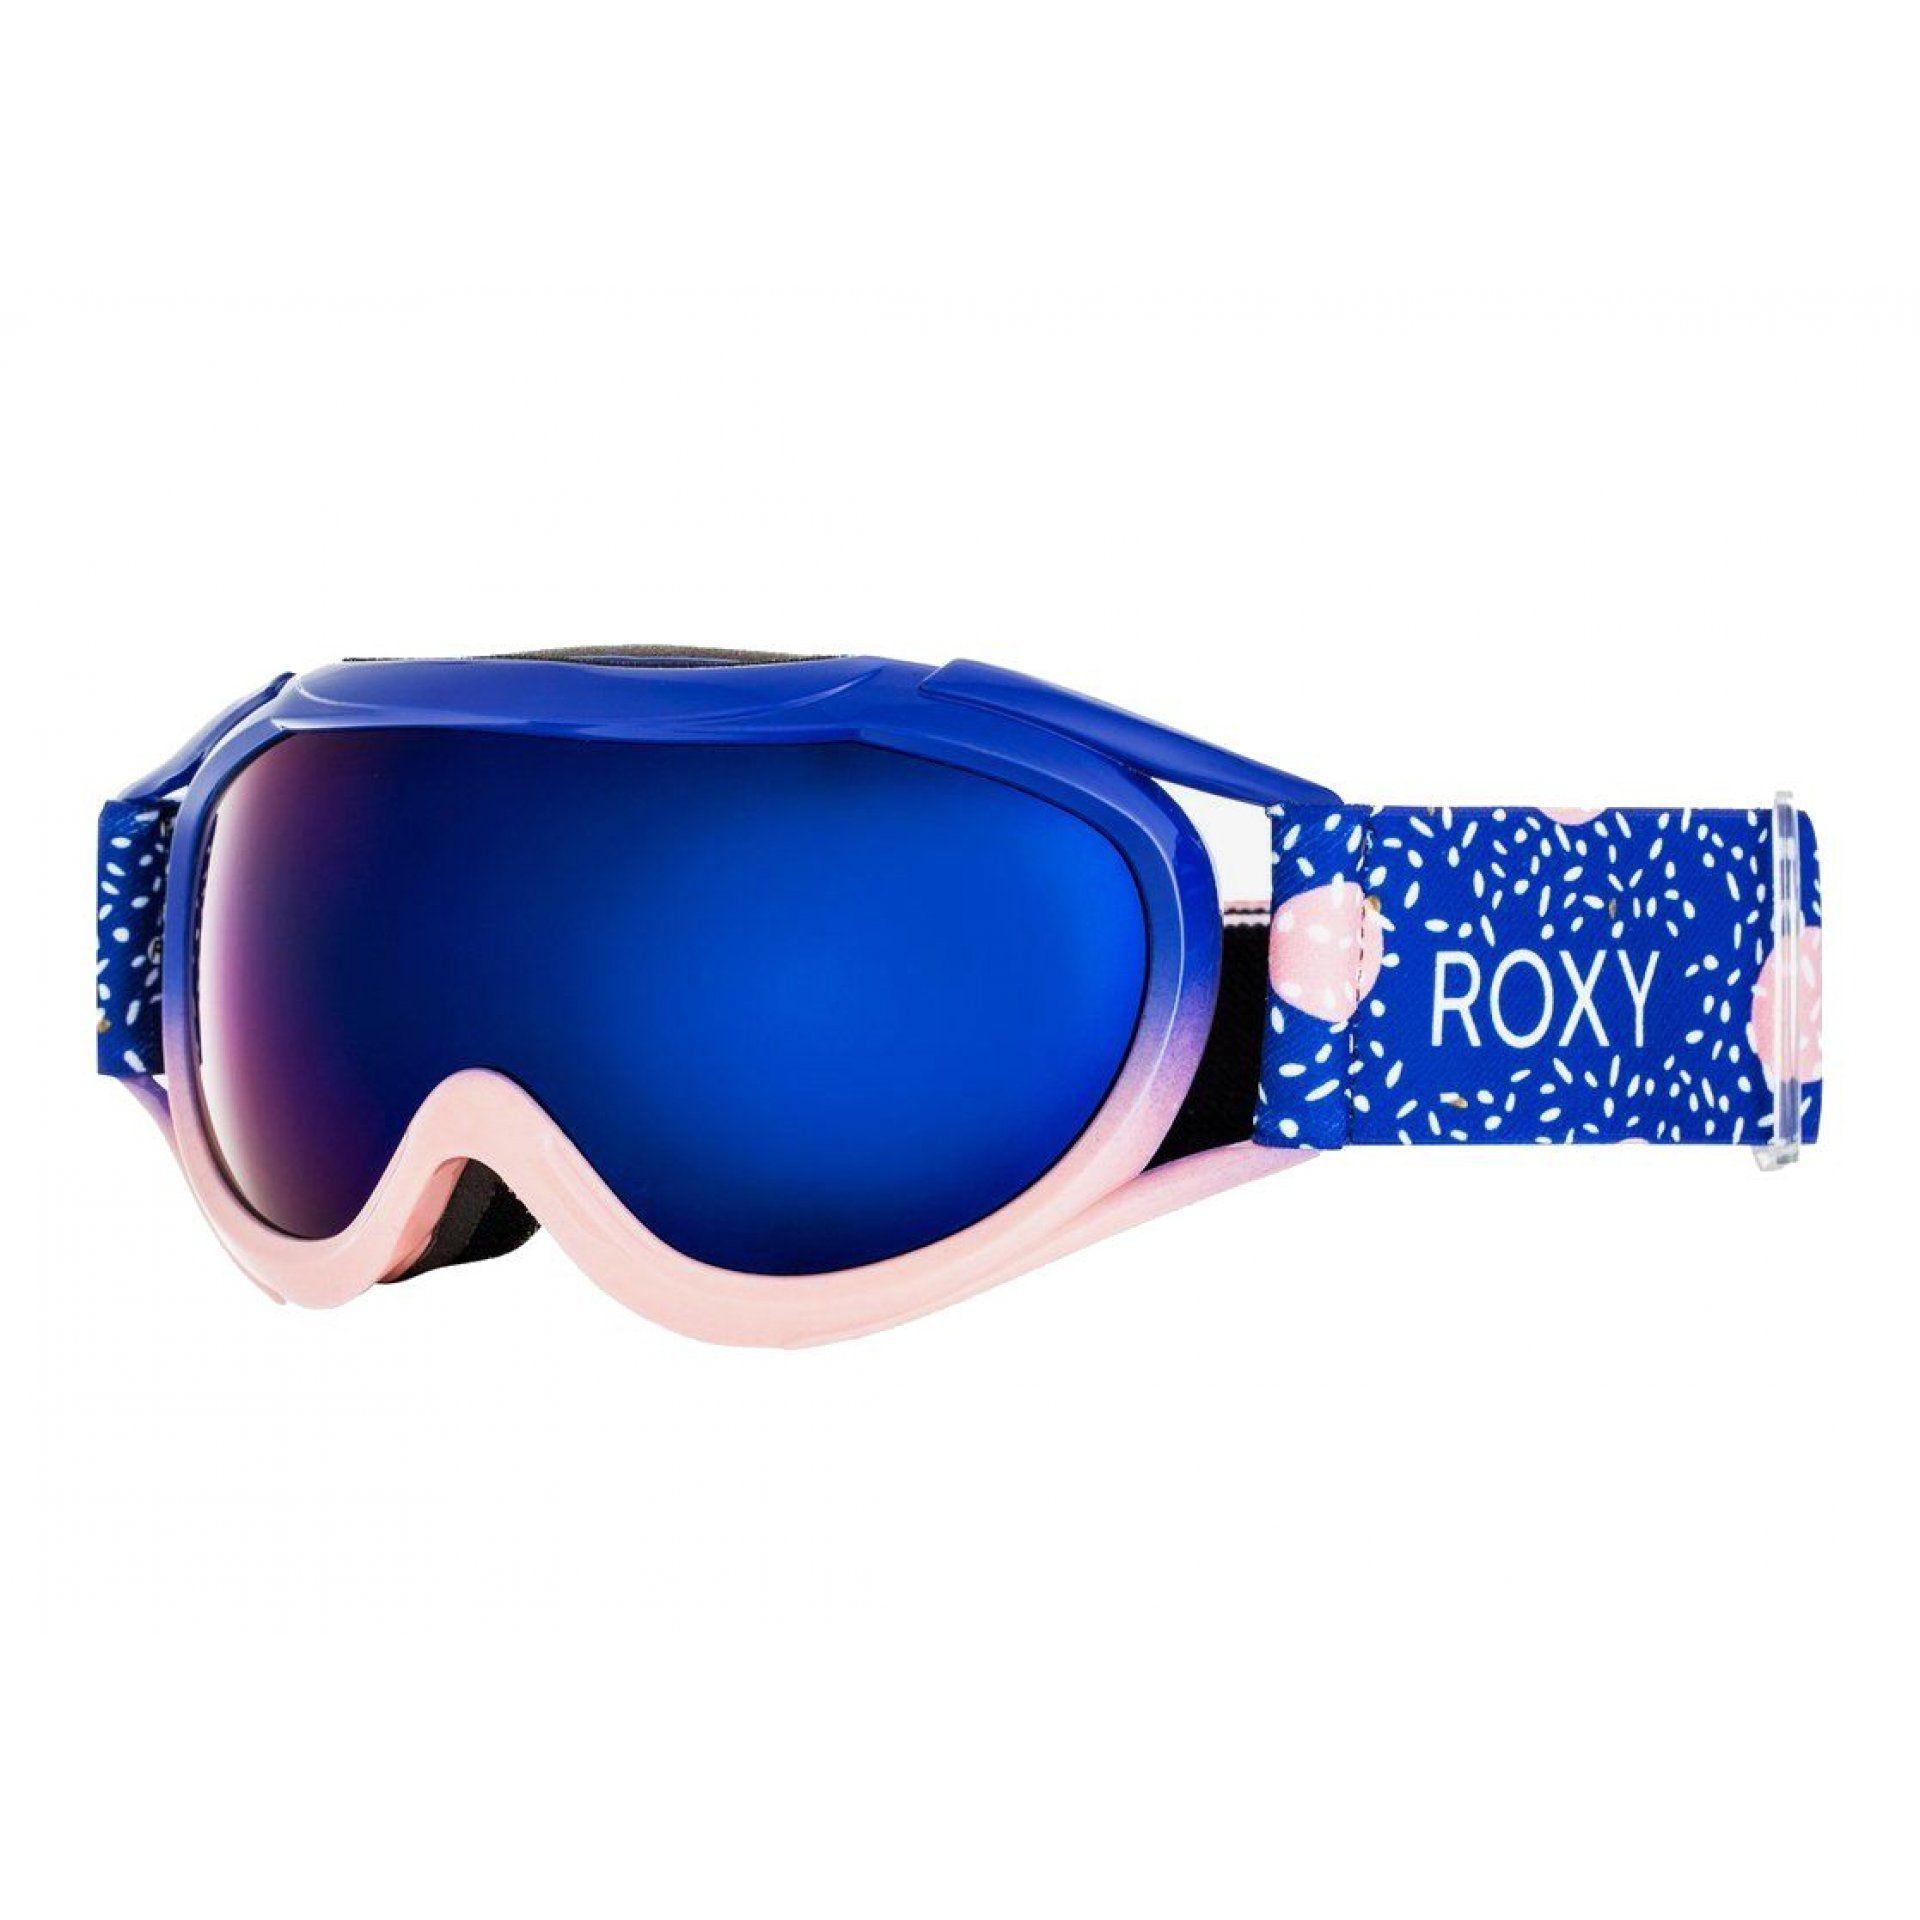 GOGLE ROXY LOOLA 2.0 2021 ERGTG03015 MAZARINE BLUE TASTY HOUR|VERMILLON ML BLUE PRR4